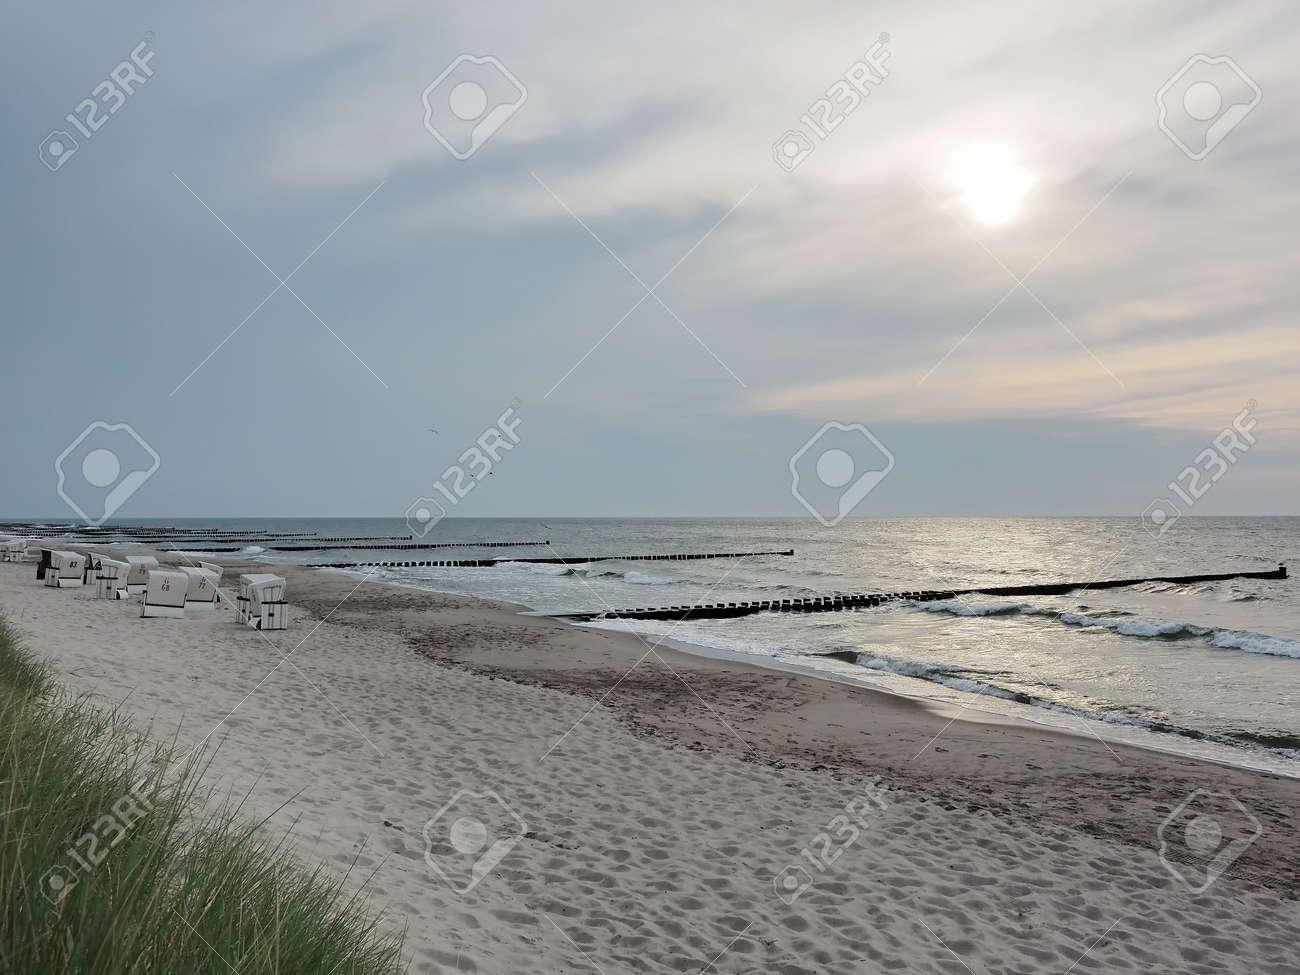 Beach at the Baltic Sea near to Ahrenshoop, Mecklenburg-Western Pomerania, at evening - 155472880